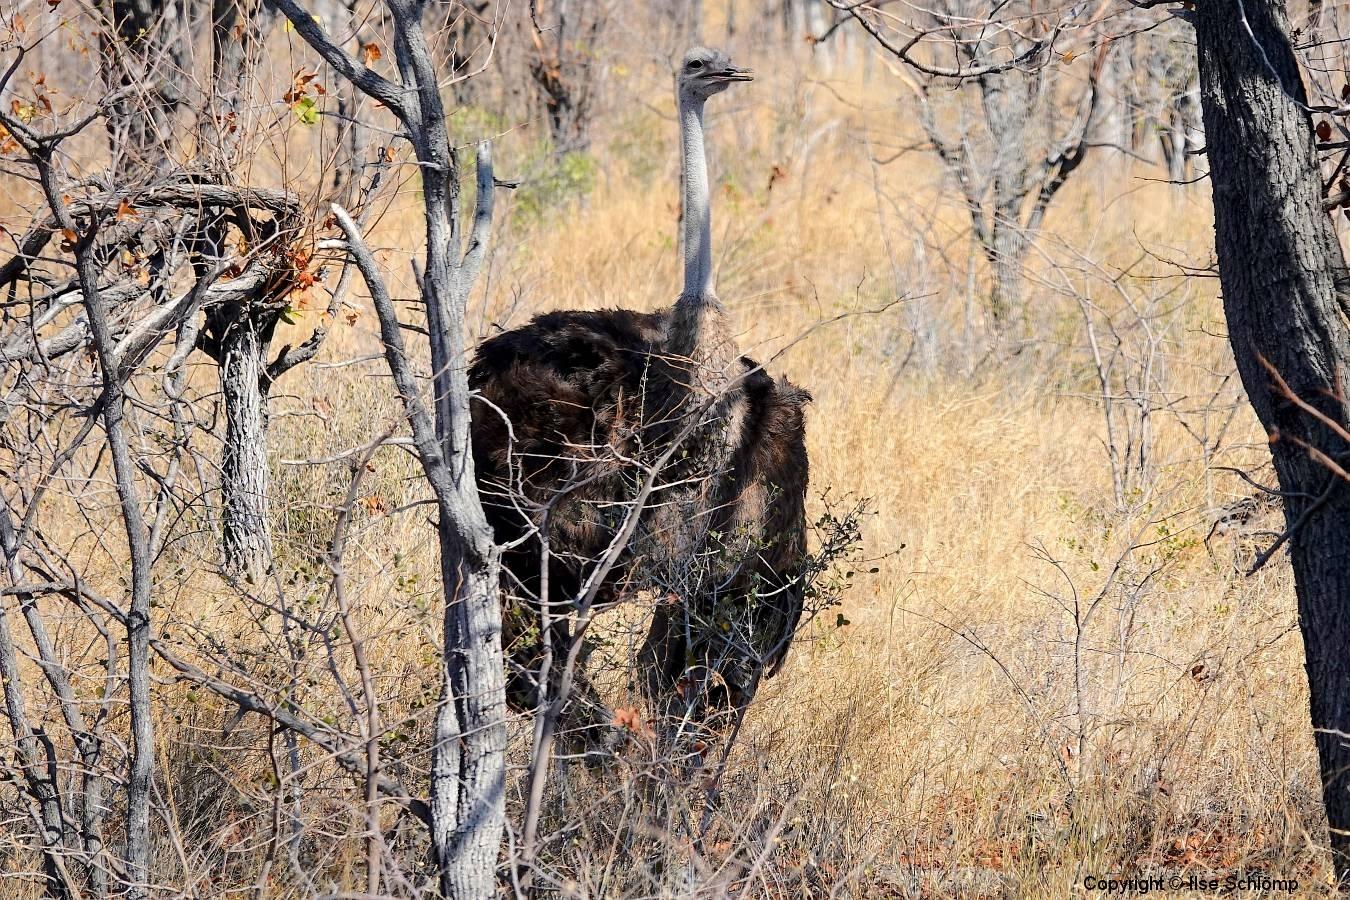 Namibia, Etosha Nationalpark, Afrikanischer Strauß